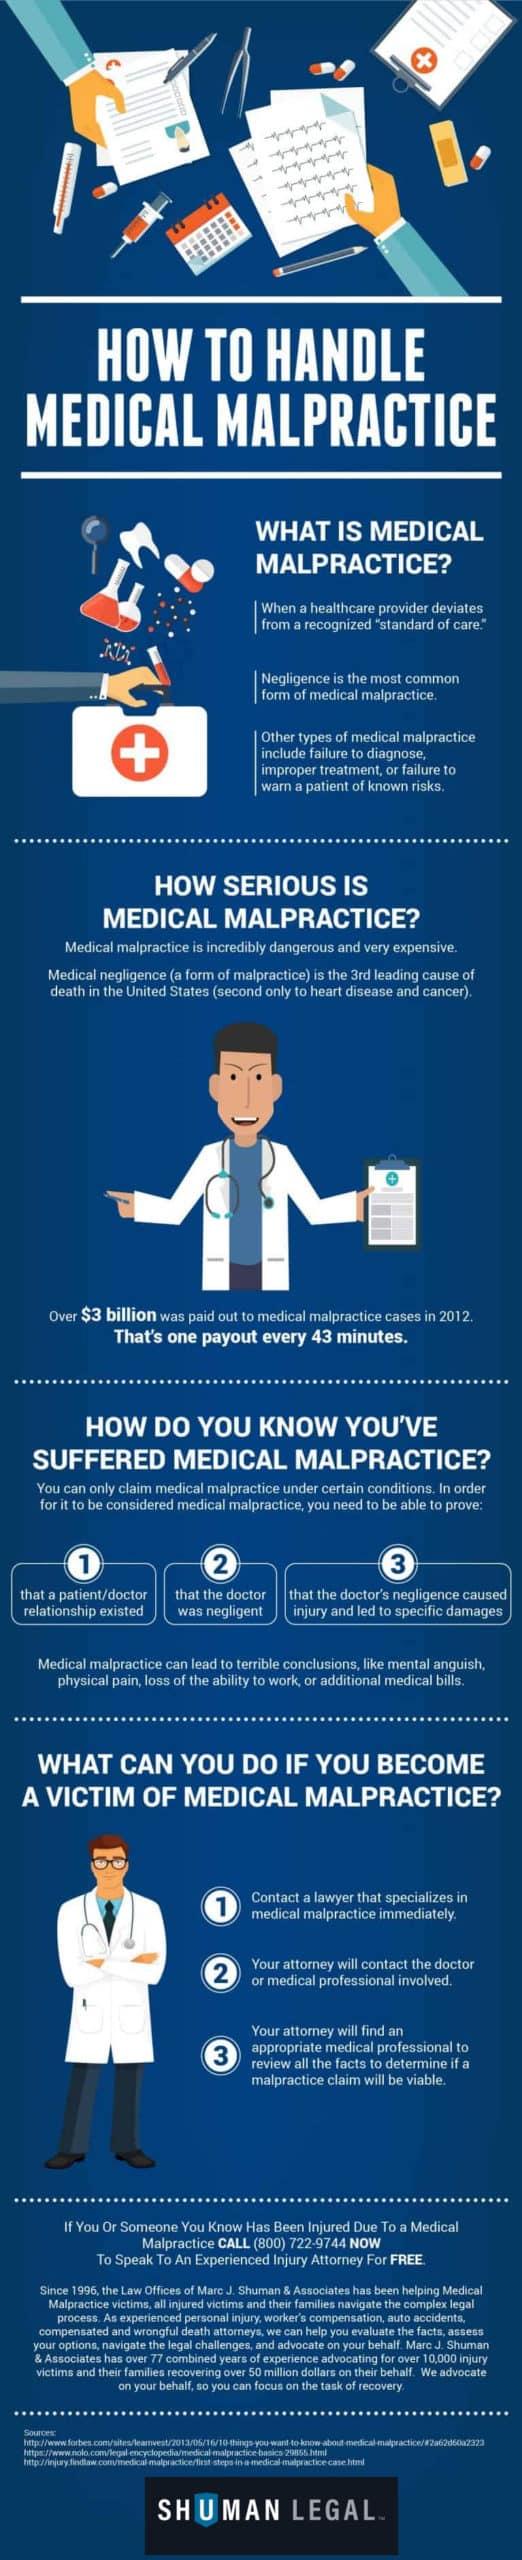 How to handle medical malpractice